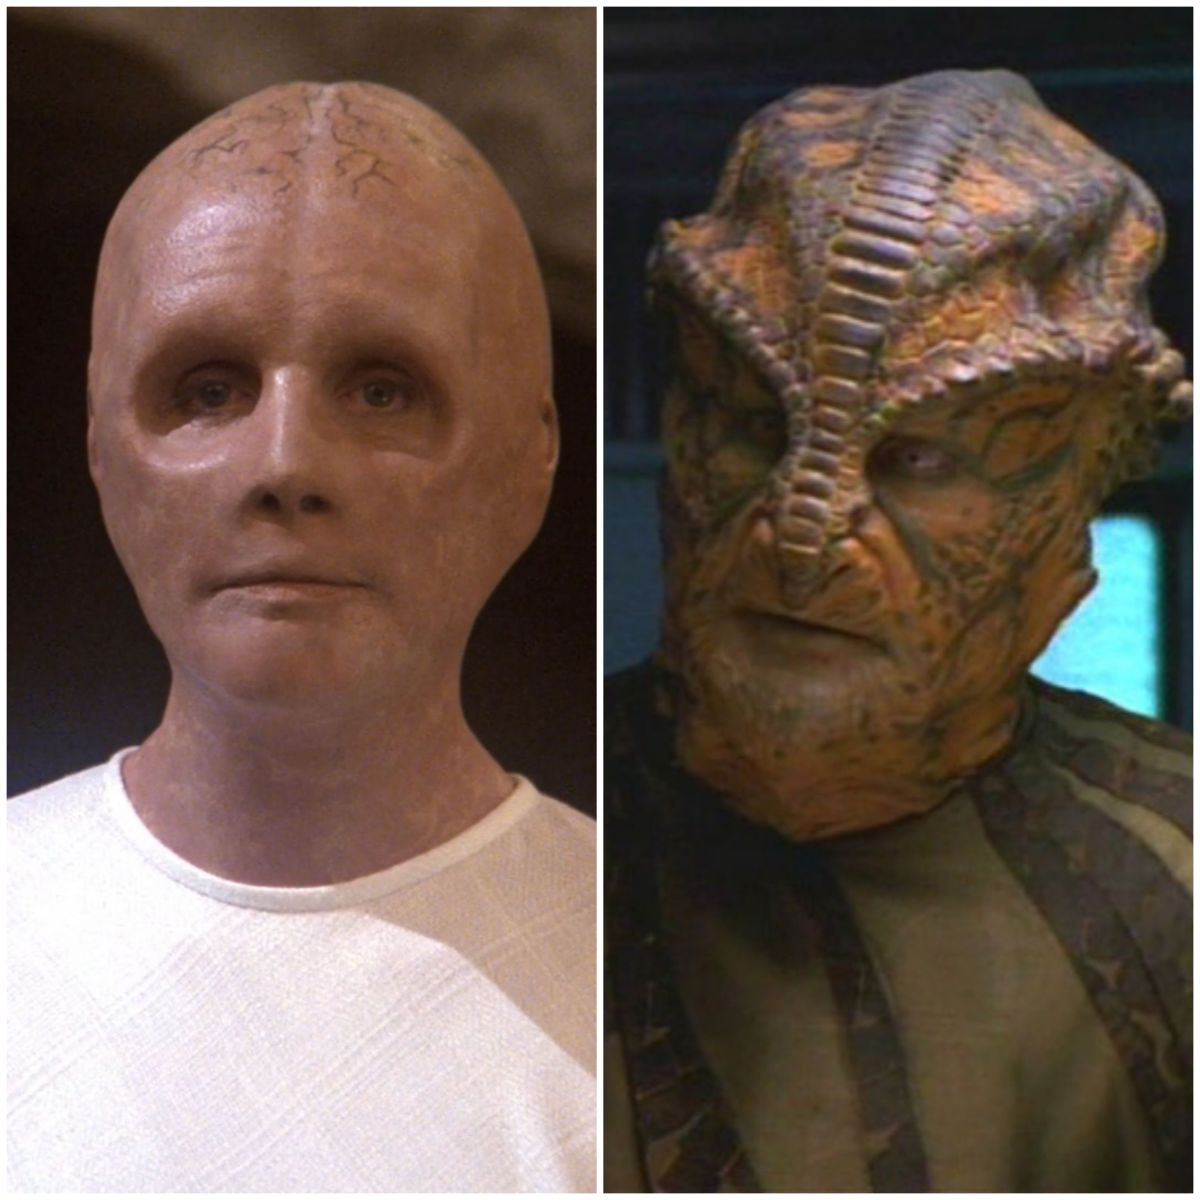 Star Trek: HumanoidOrigins